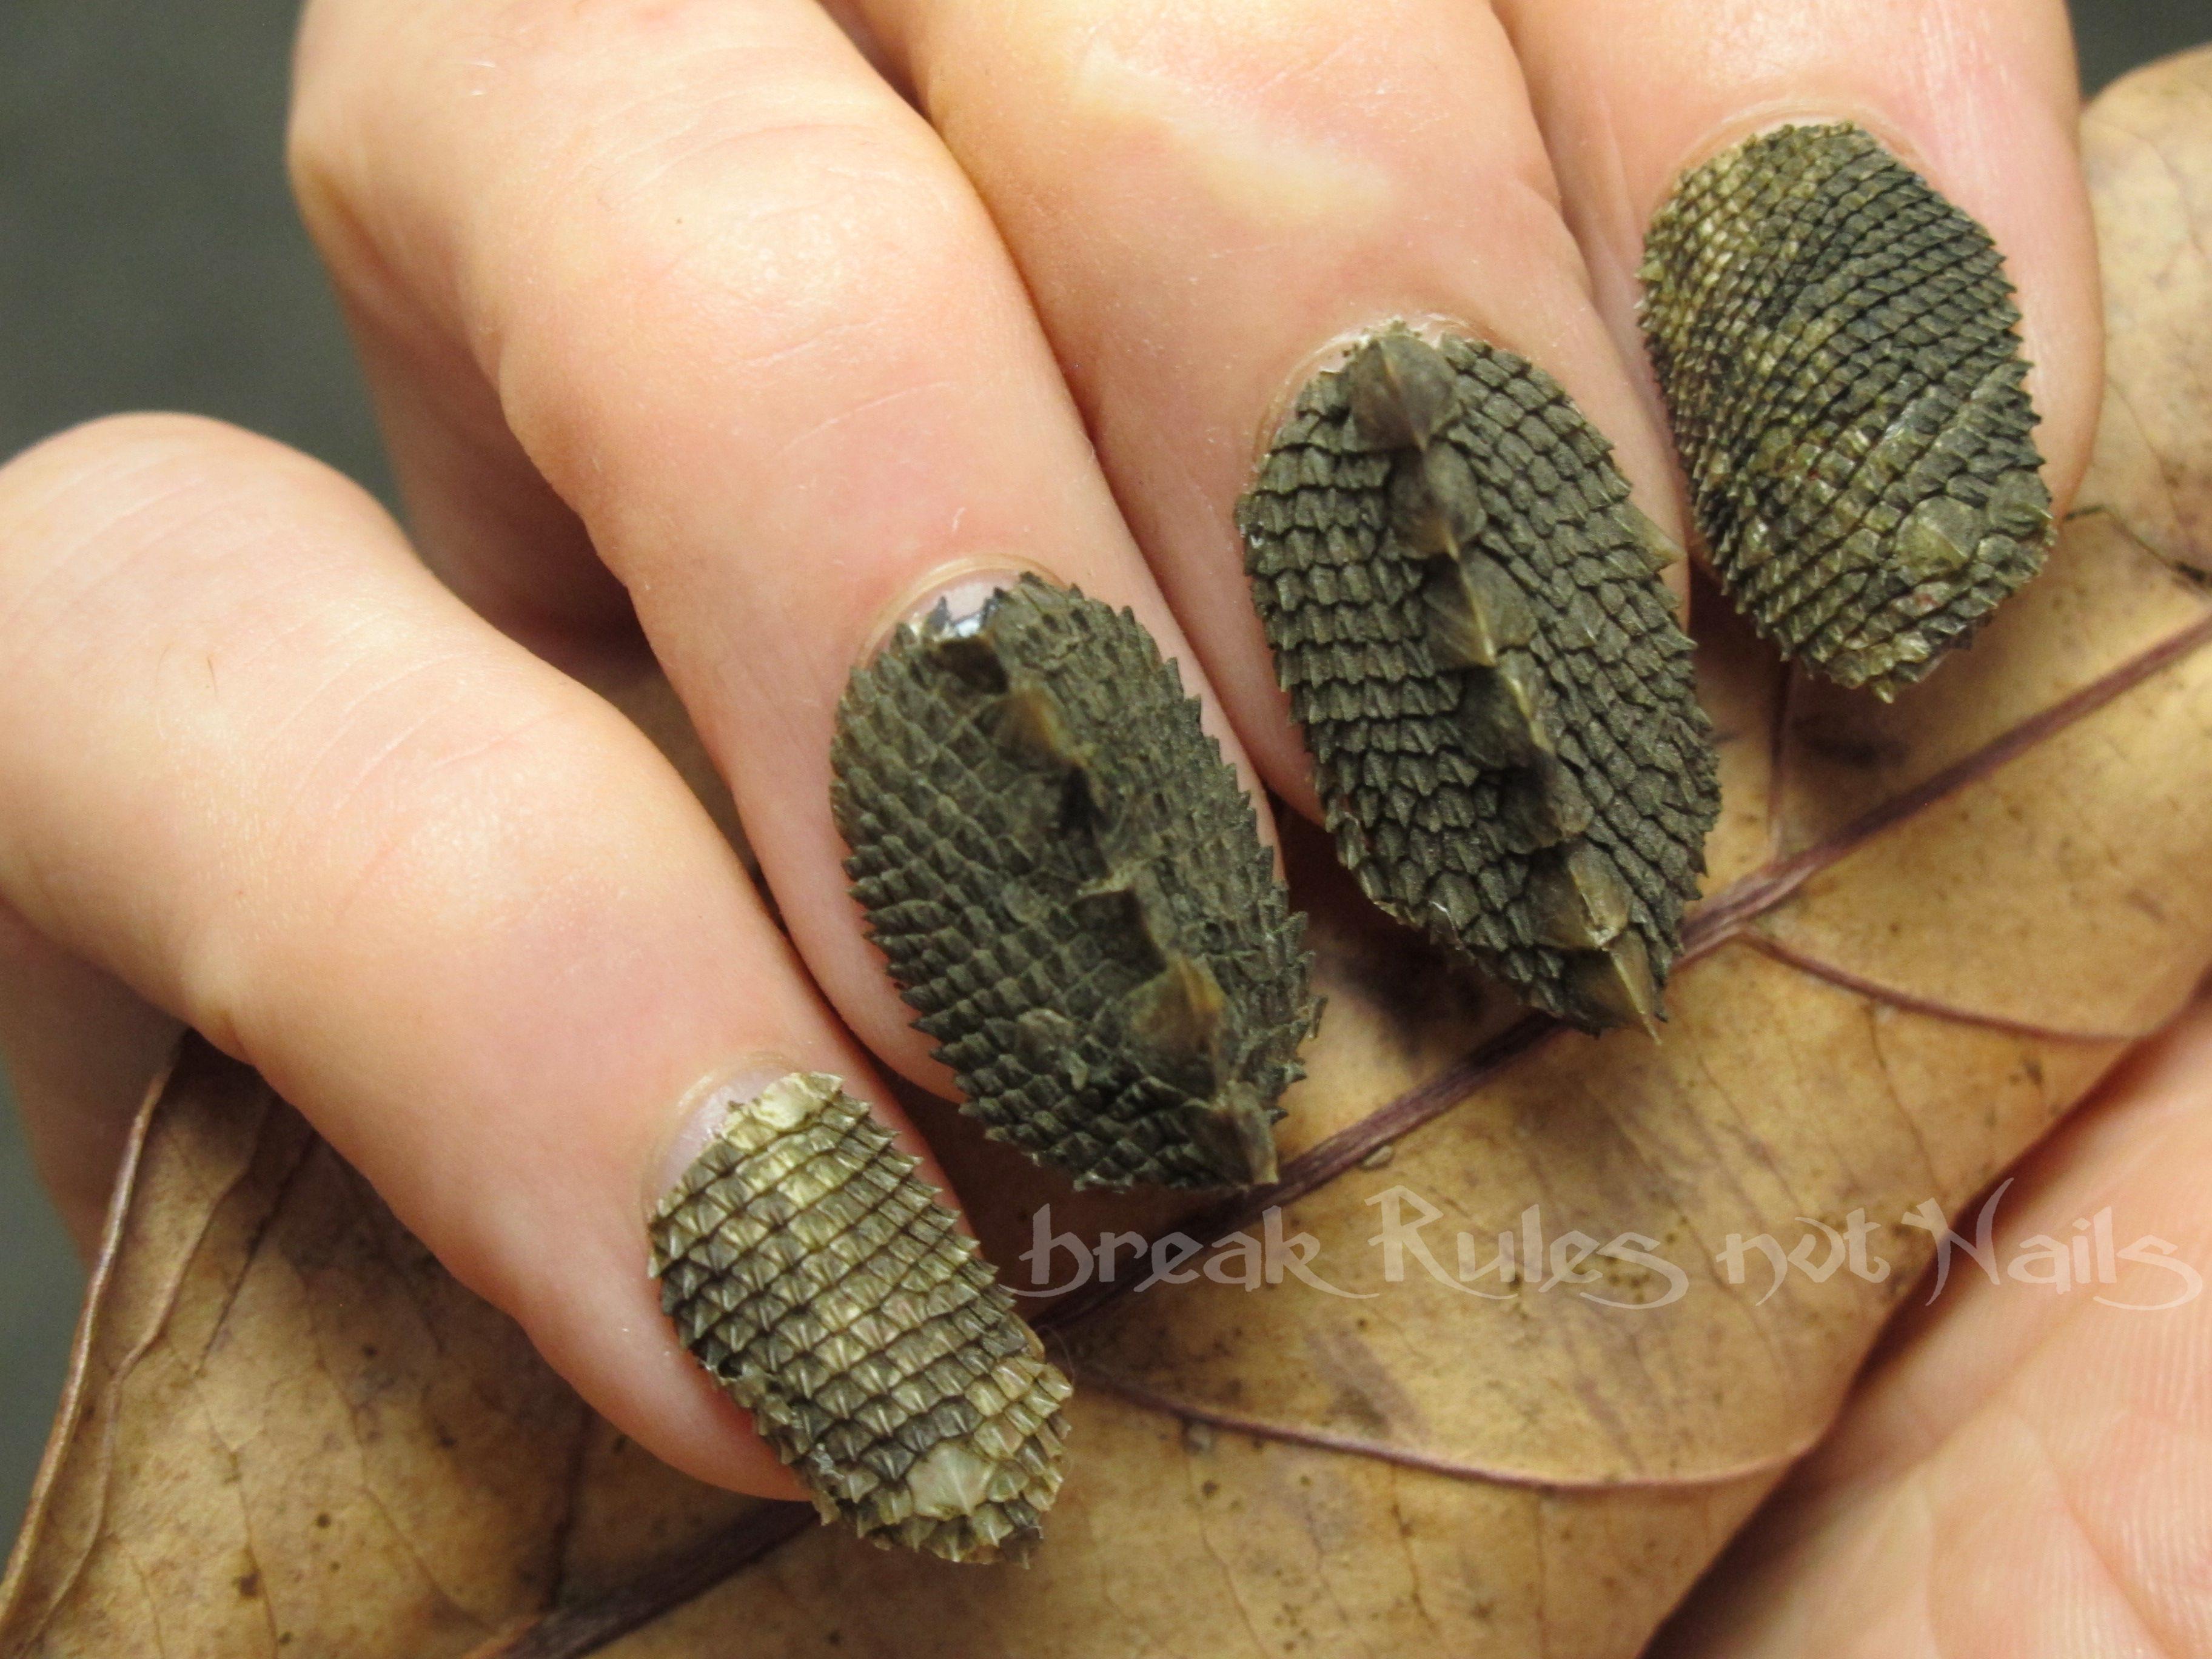 fake nails | Break rules, not nails